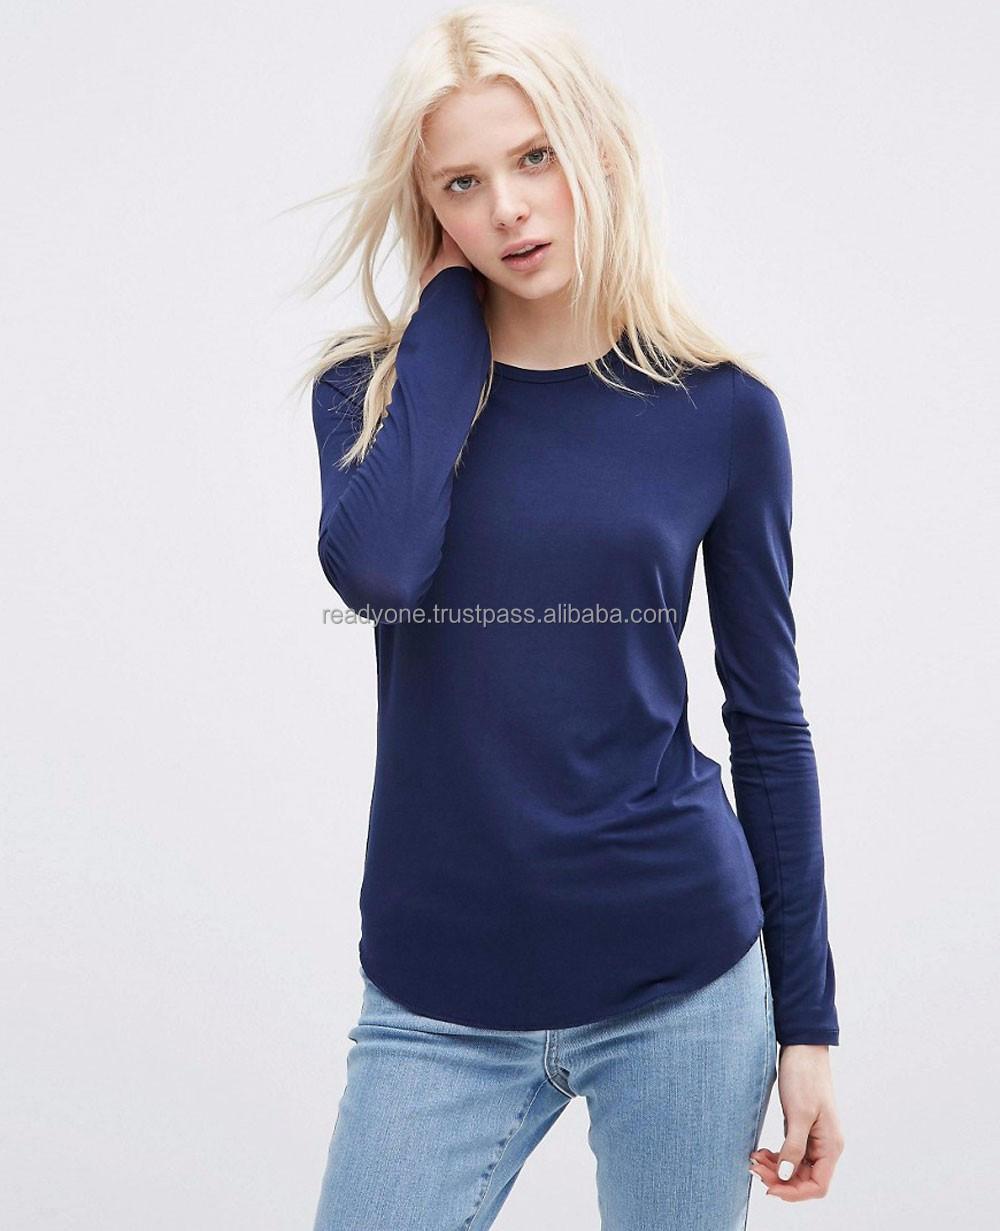 Design your own t-shirt female - Wholesale Crew Neck Short Sleeve Design Your Own T Shirt Custom Cheap Women T Shirt Wholesale Crew Neck Short Sleeve Design Your Own T Shirt Custom Cheap